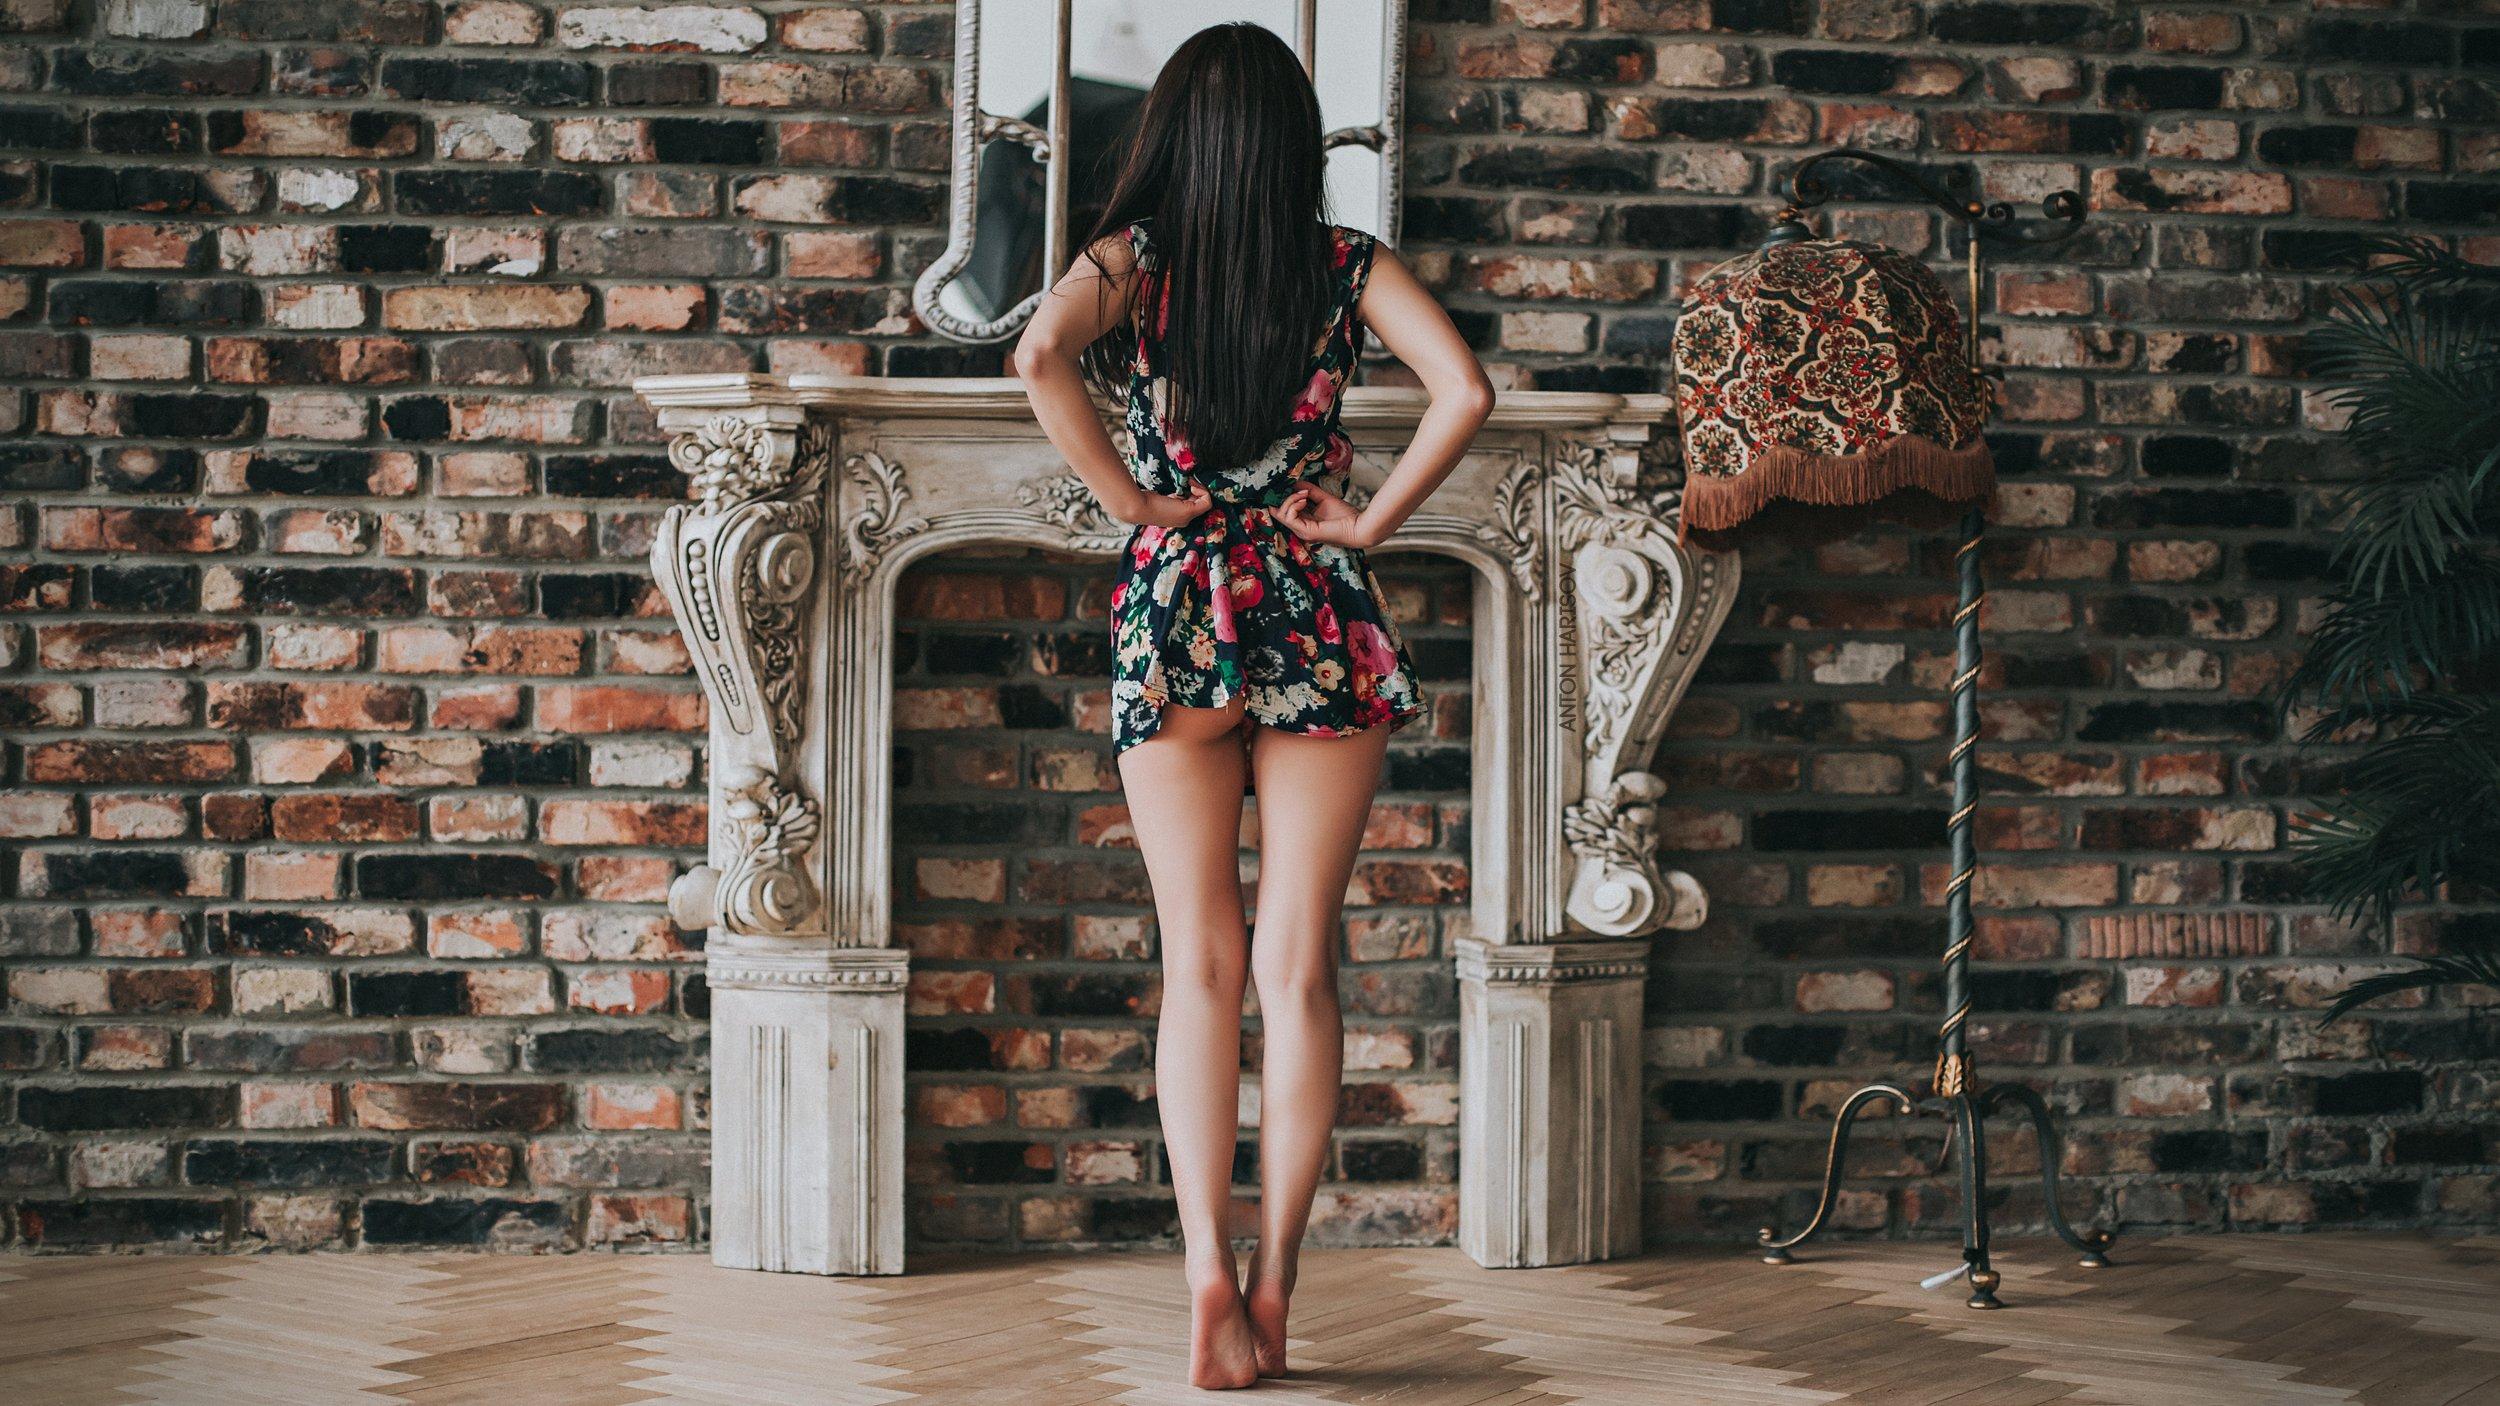 portrait, girl, beauty, eyes, russian, canon, fashion, woman, art, sexy, femme, movie, mood, cinematic, inspiration, daylight, popular, post-processing, antonharisov, fotoshi, portrait photography, fashion model, cinematic, Антон Харисов